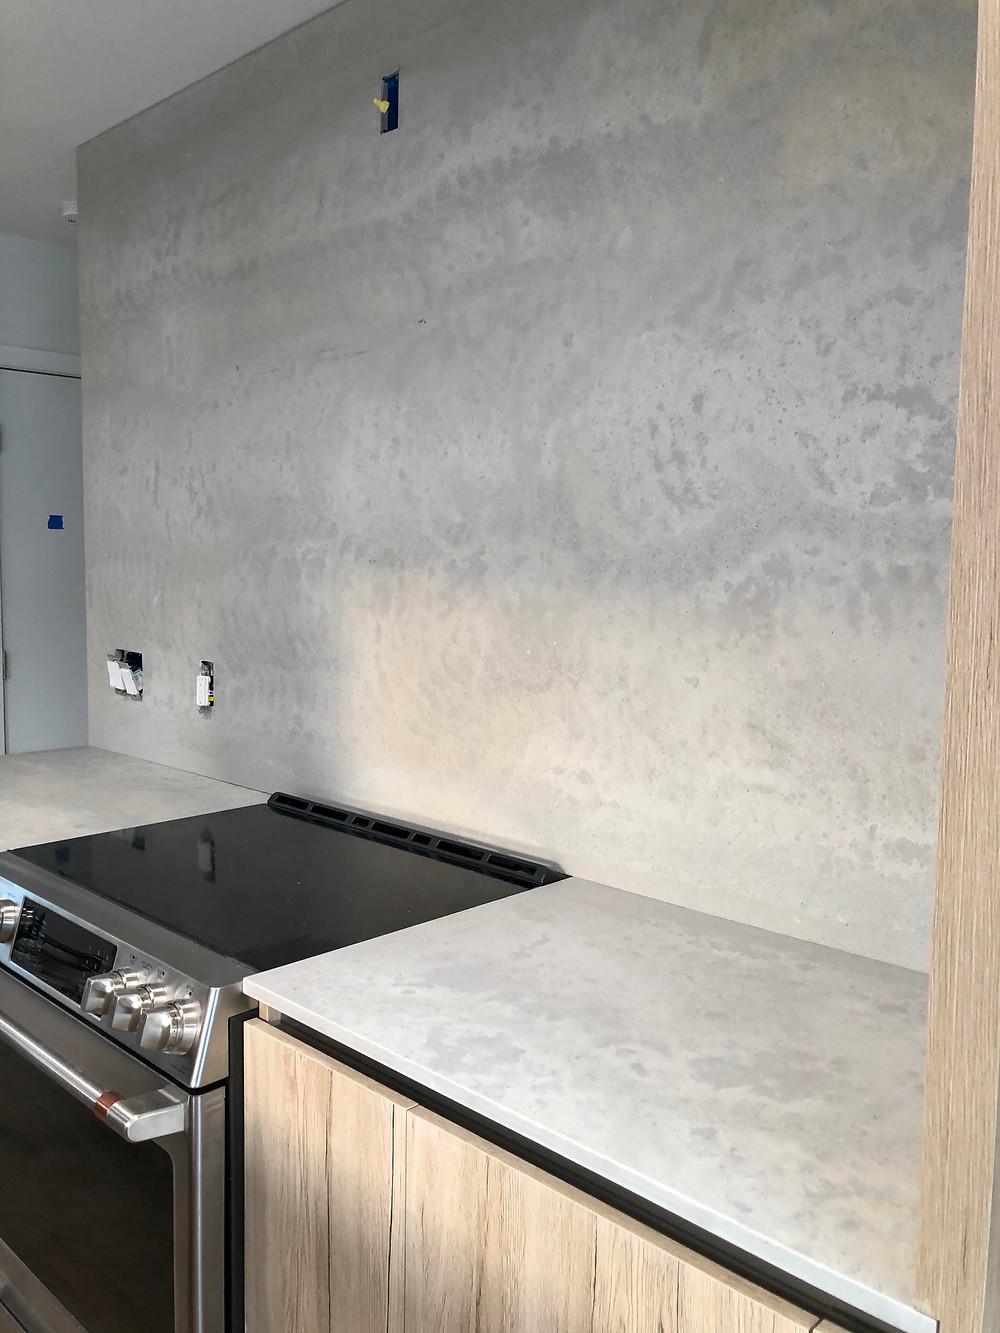 Fr Caesarstone Quartz countertops installer contact Stone and Quartz LLC experts in Caesarstone quartz kitchen countertops installation. Boca Raton FL